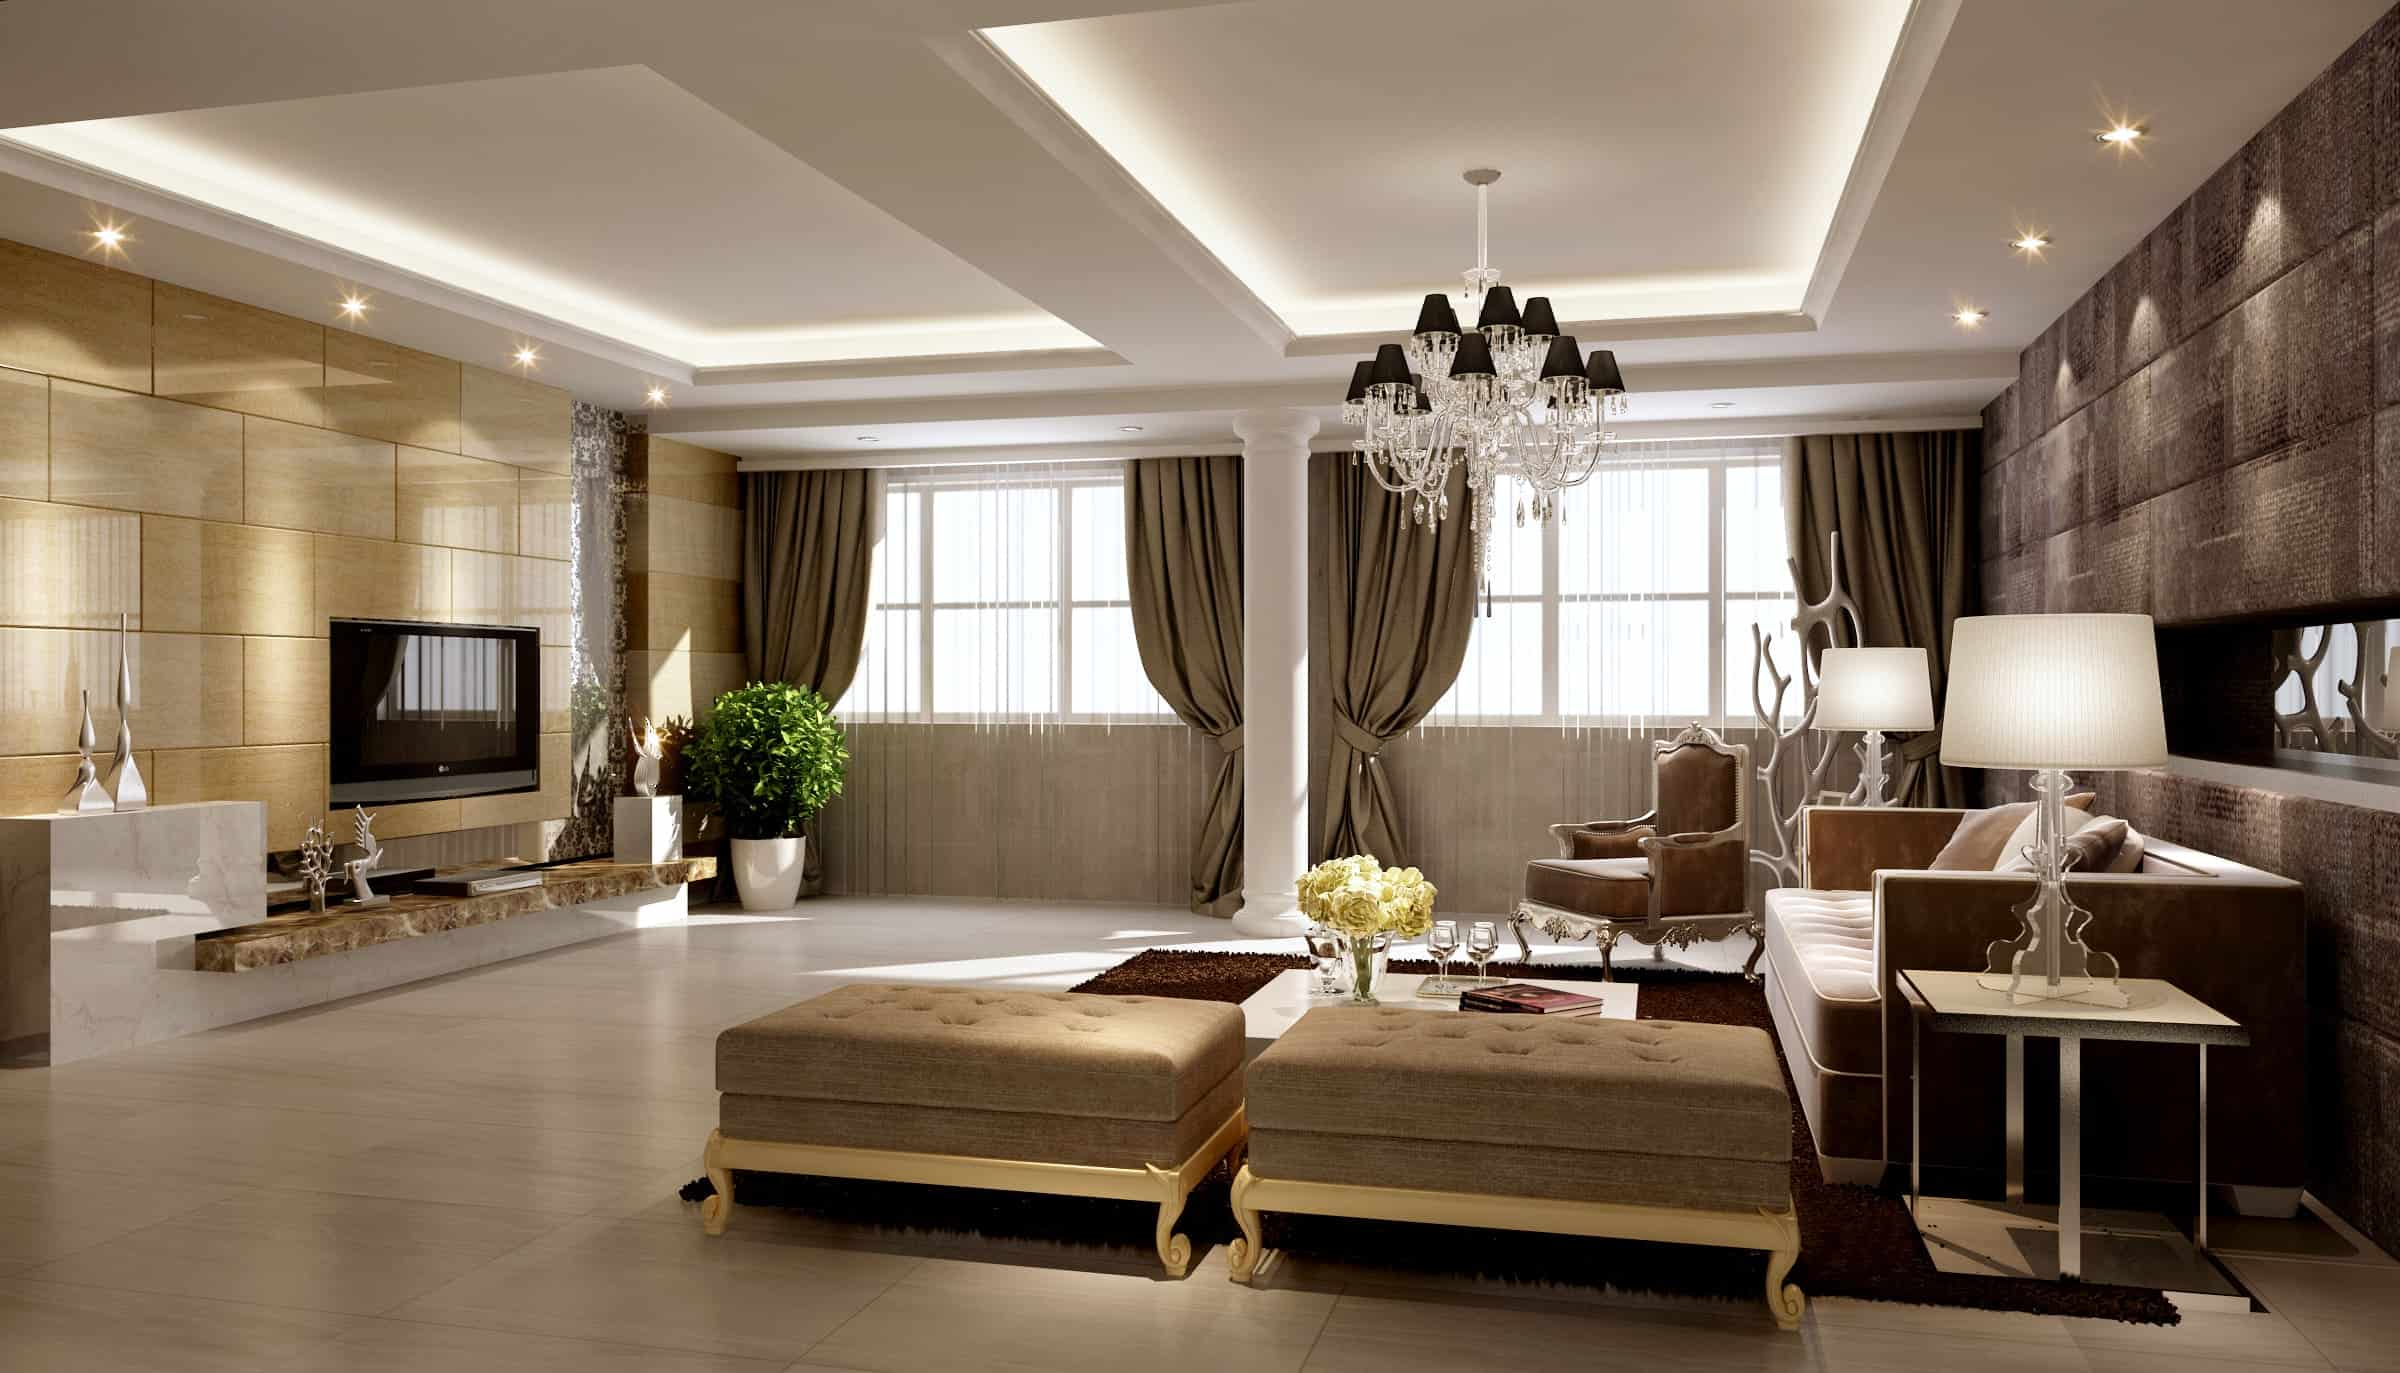 Modelos de sala de estar pequena simples decorada 105 for Modelos de sala de estar